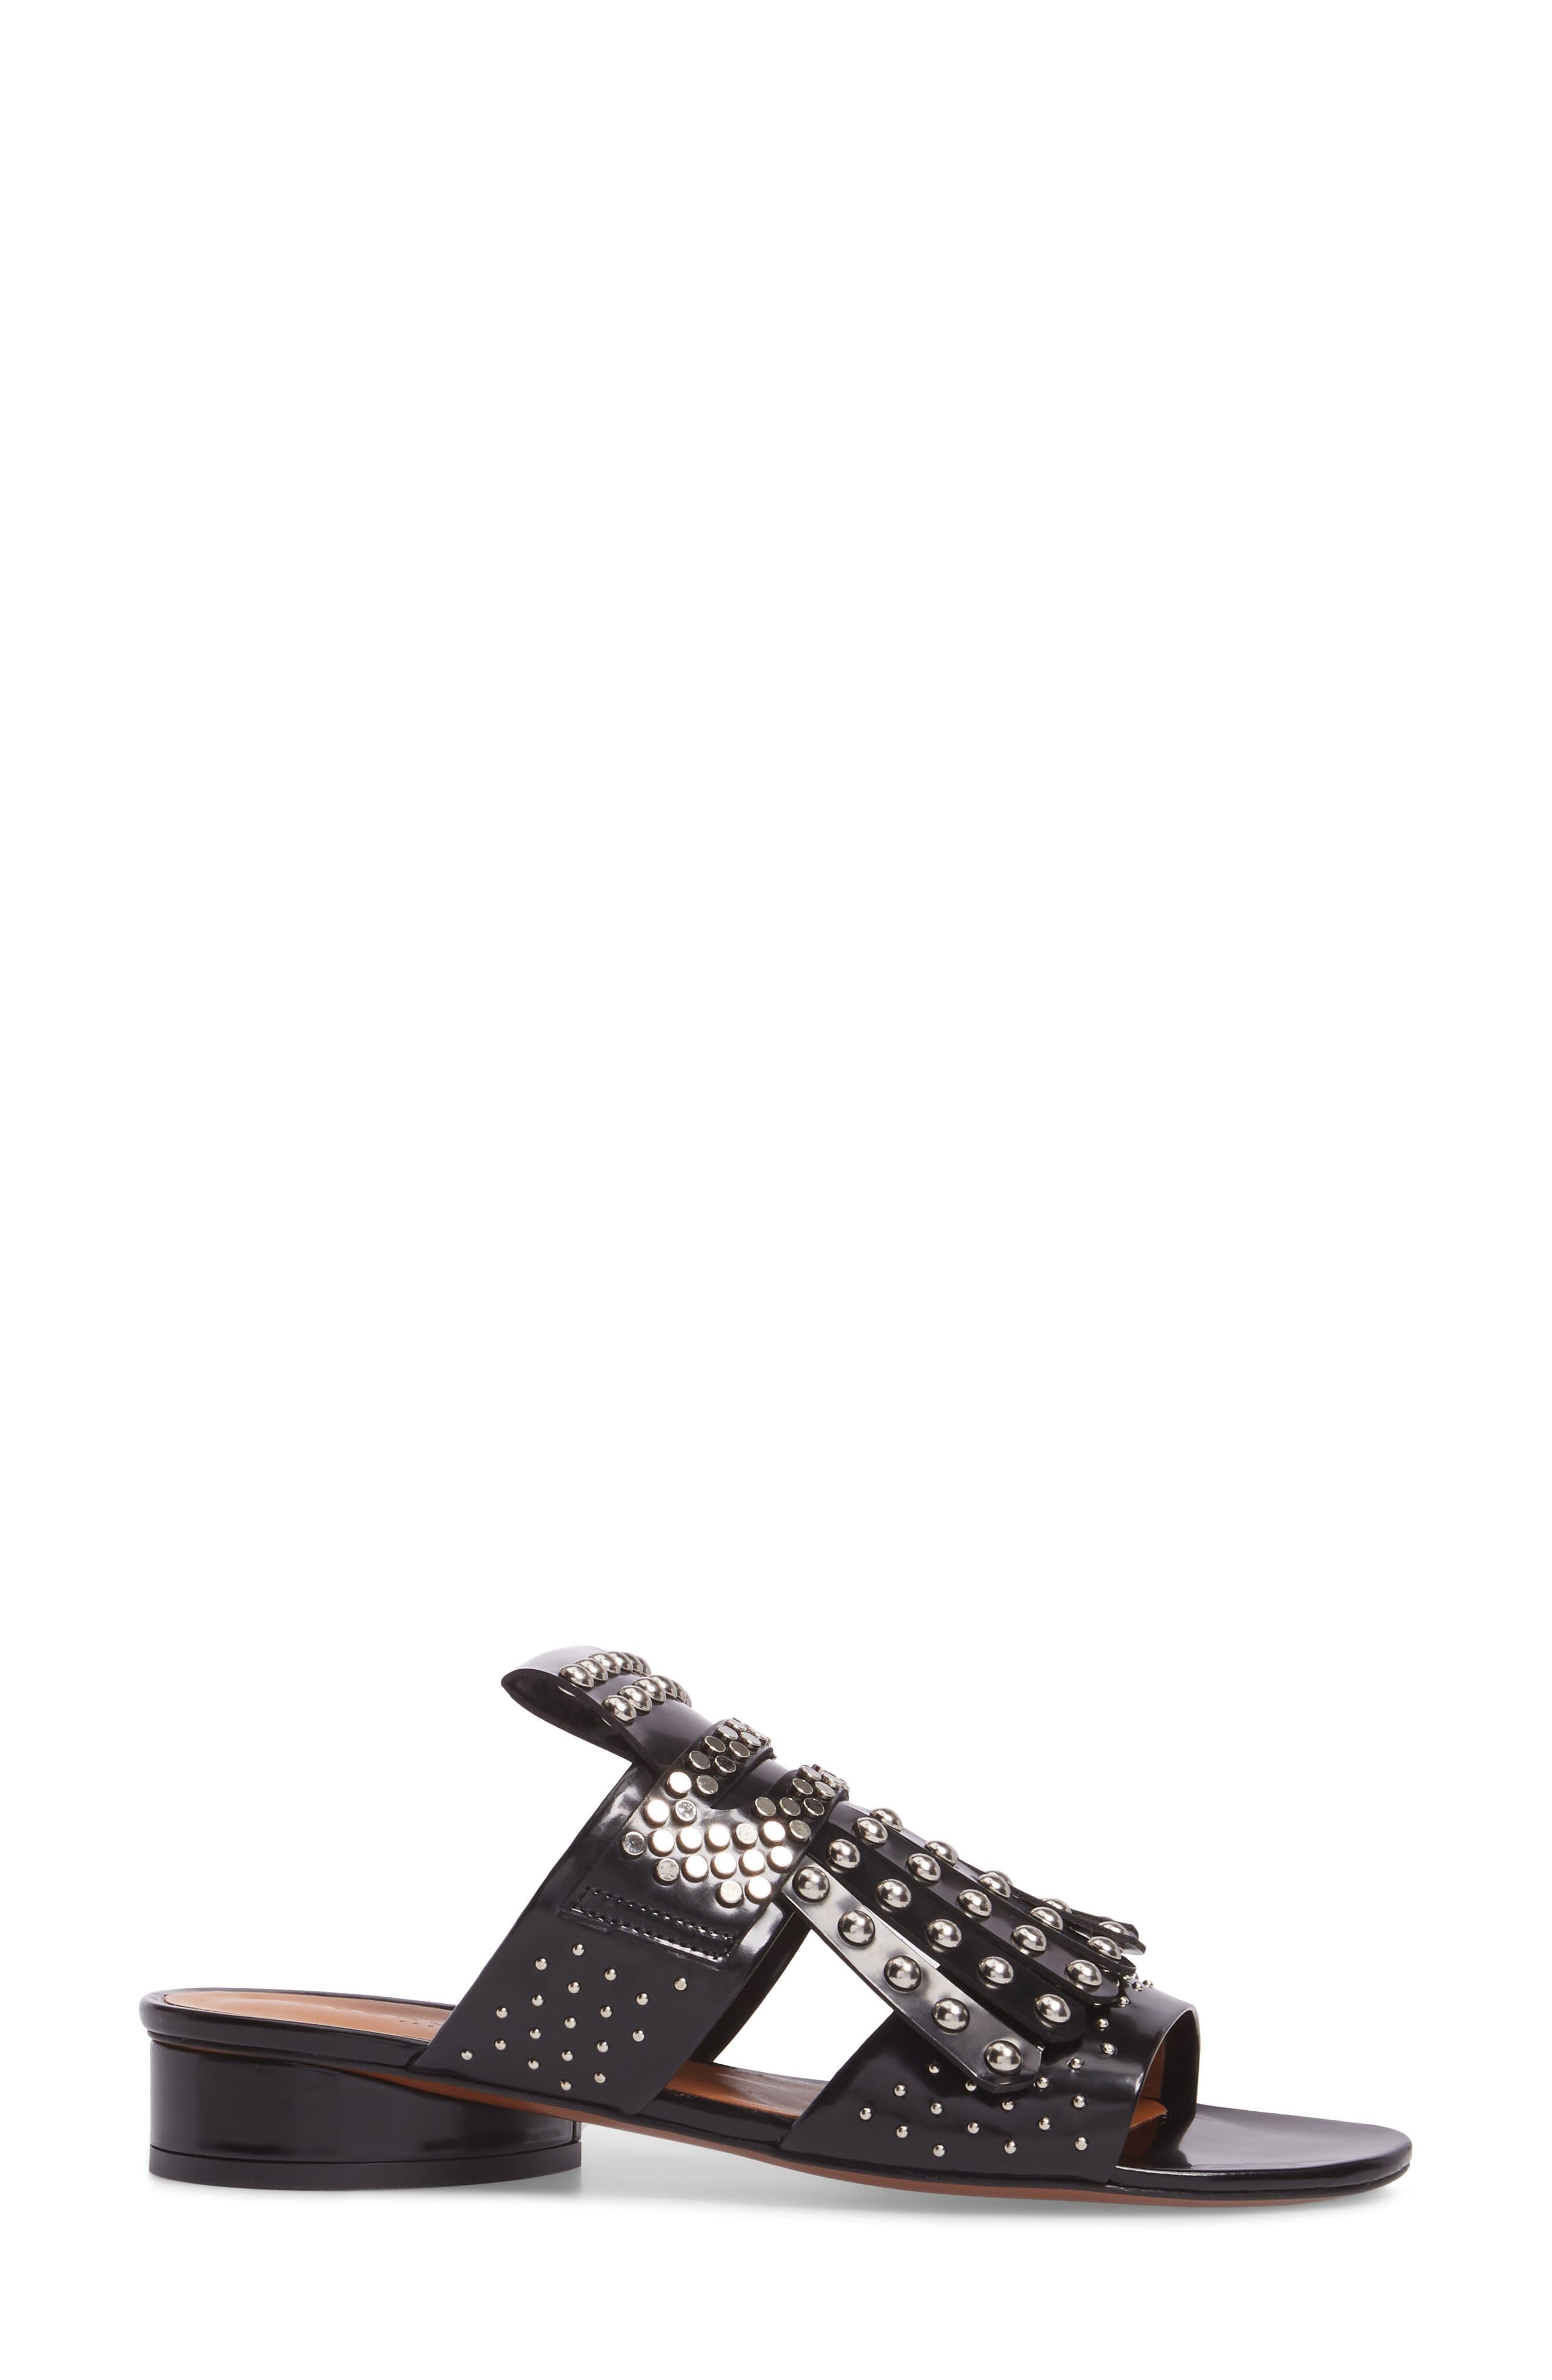 Figlouc Studded Sandal,                             Alternate thumbnail 3, color,                             001